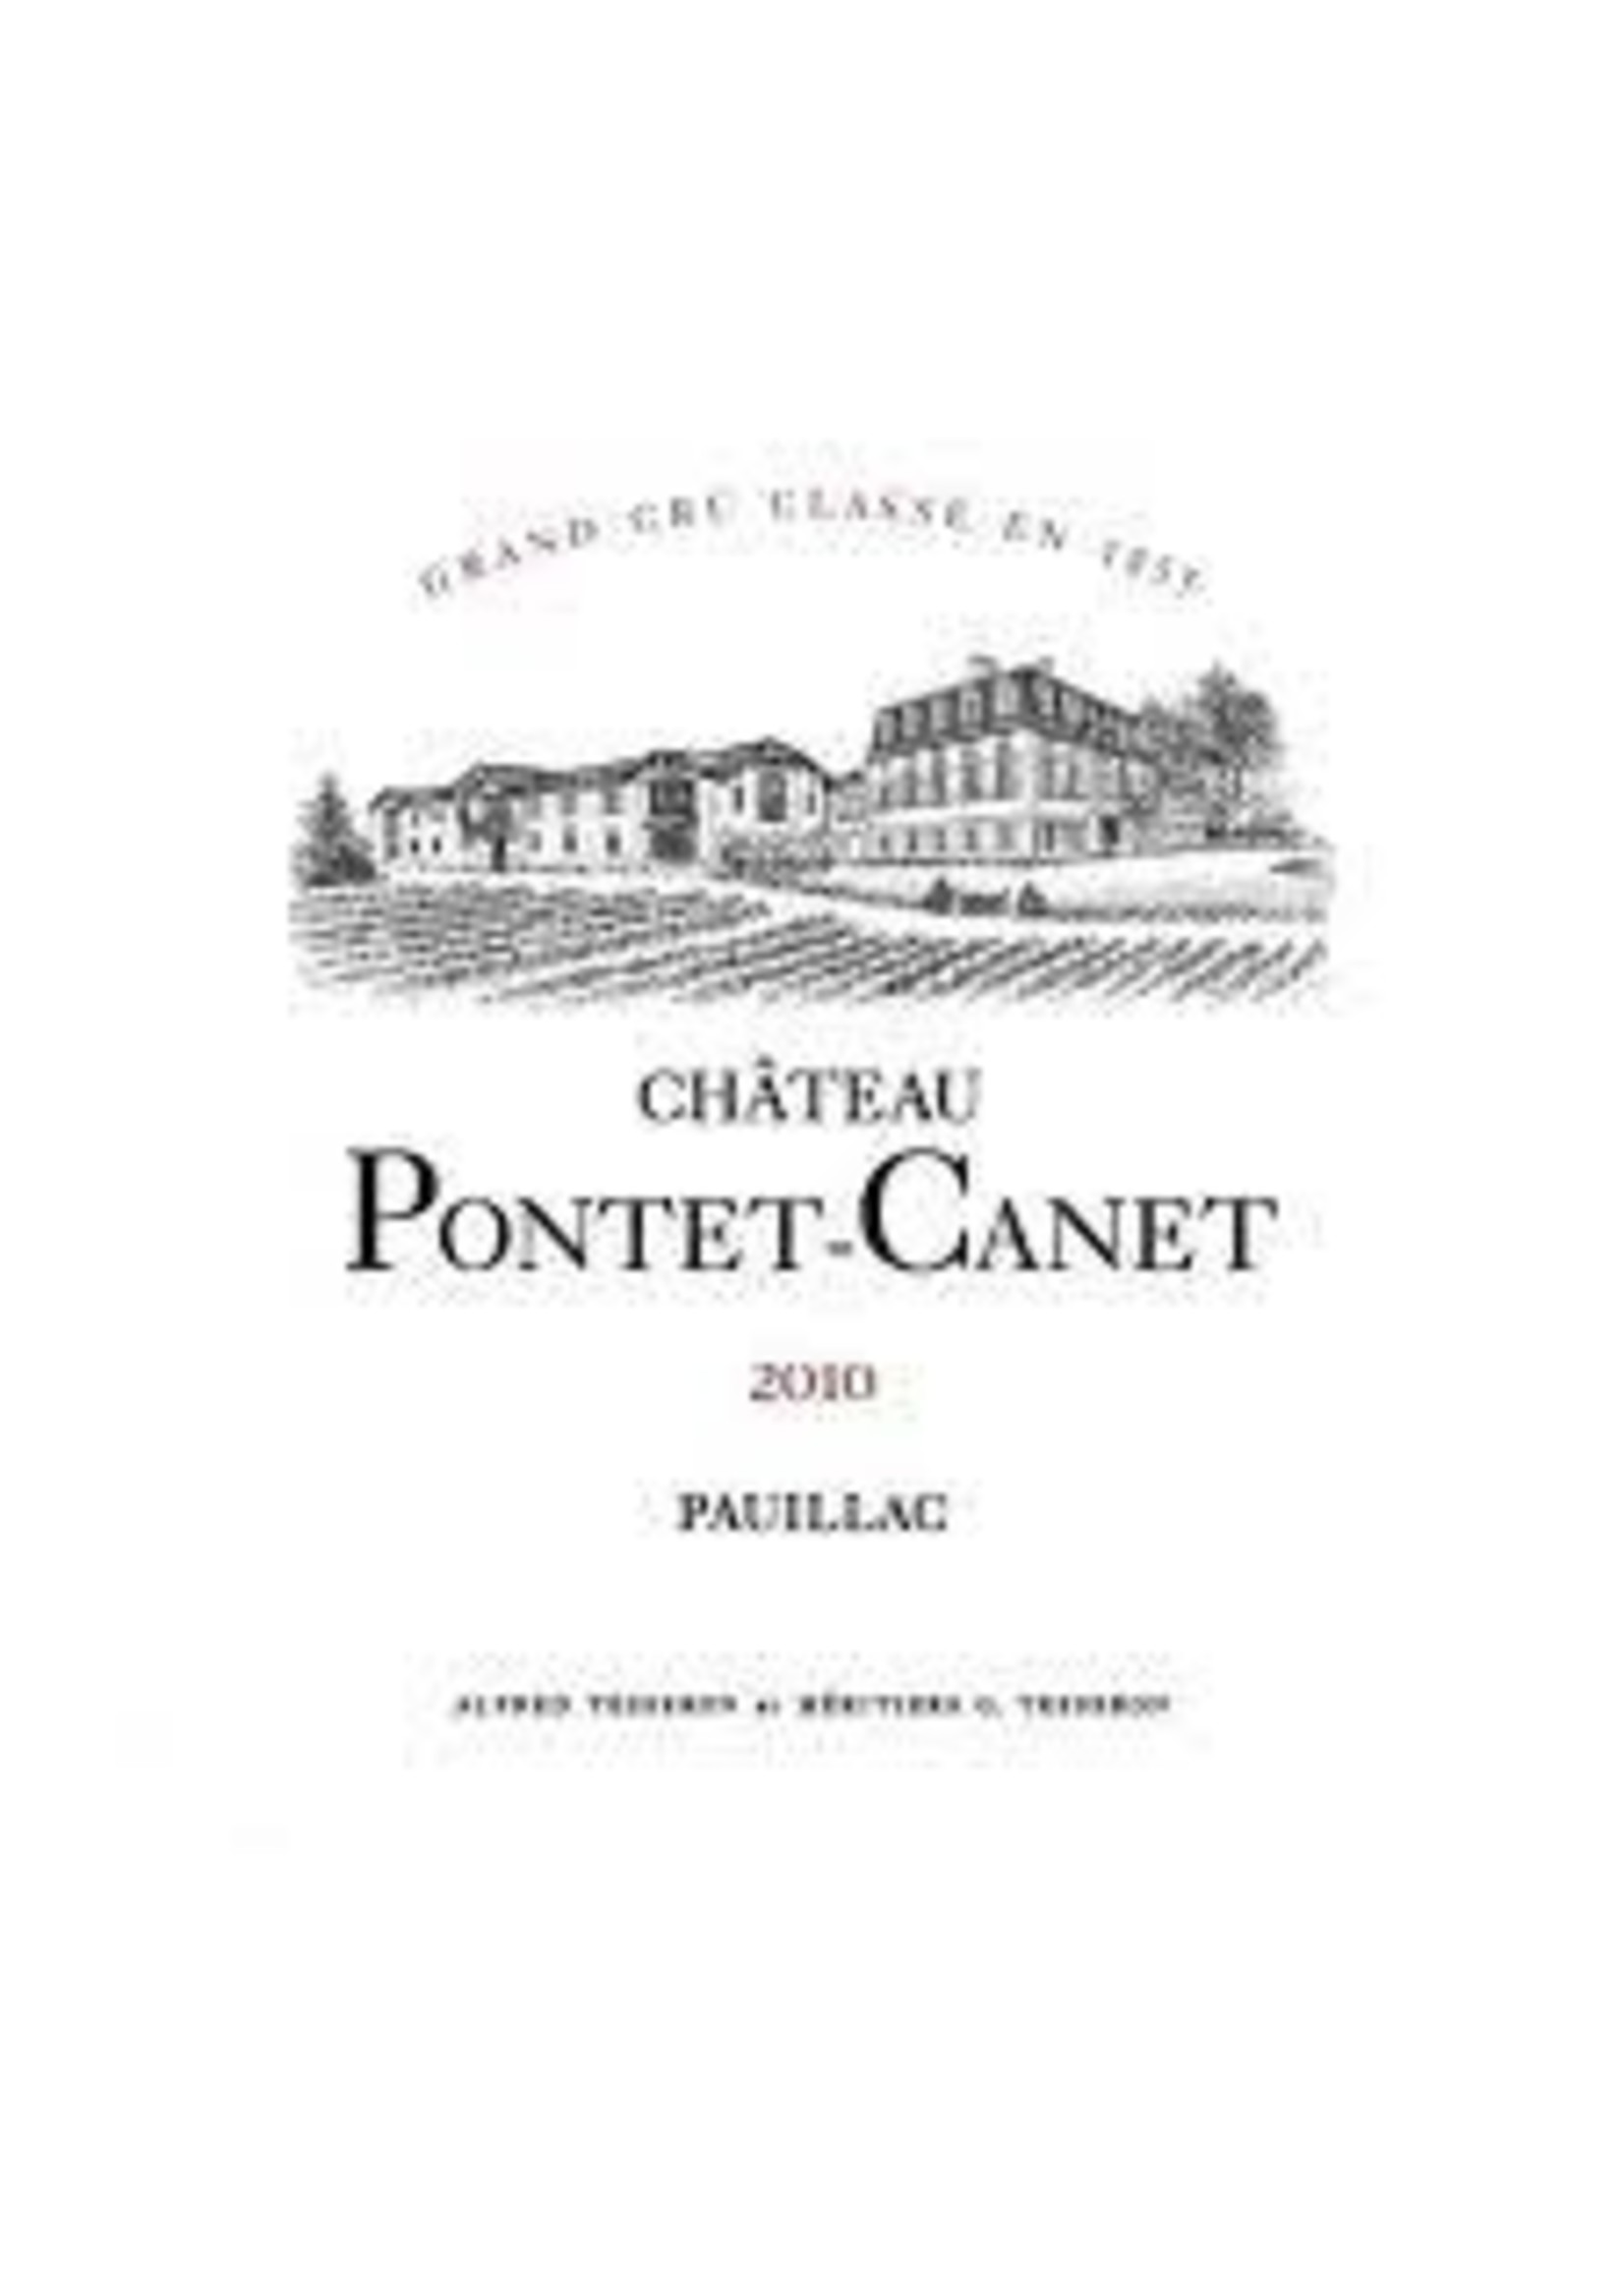 Chateau Pontet Canet 2010 Pauillac 750ml [PRE-ARRIVAL]